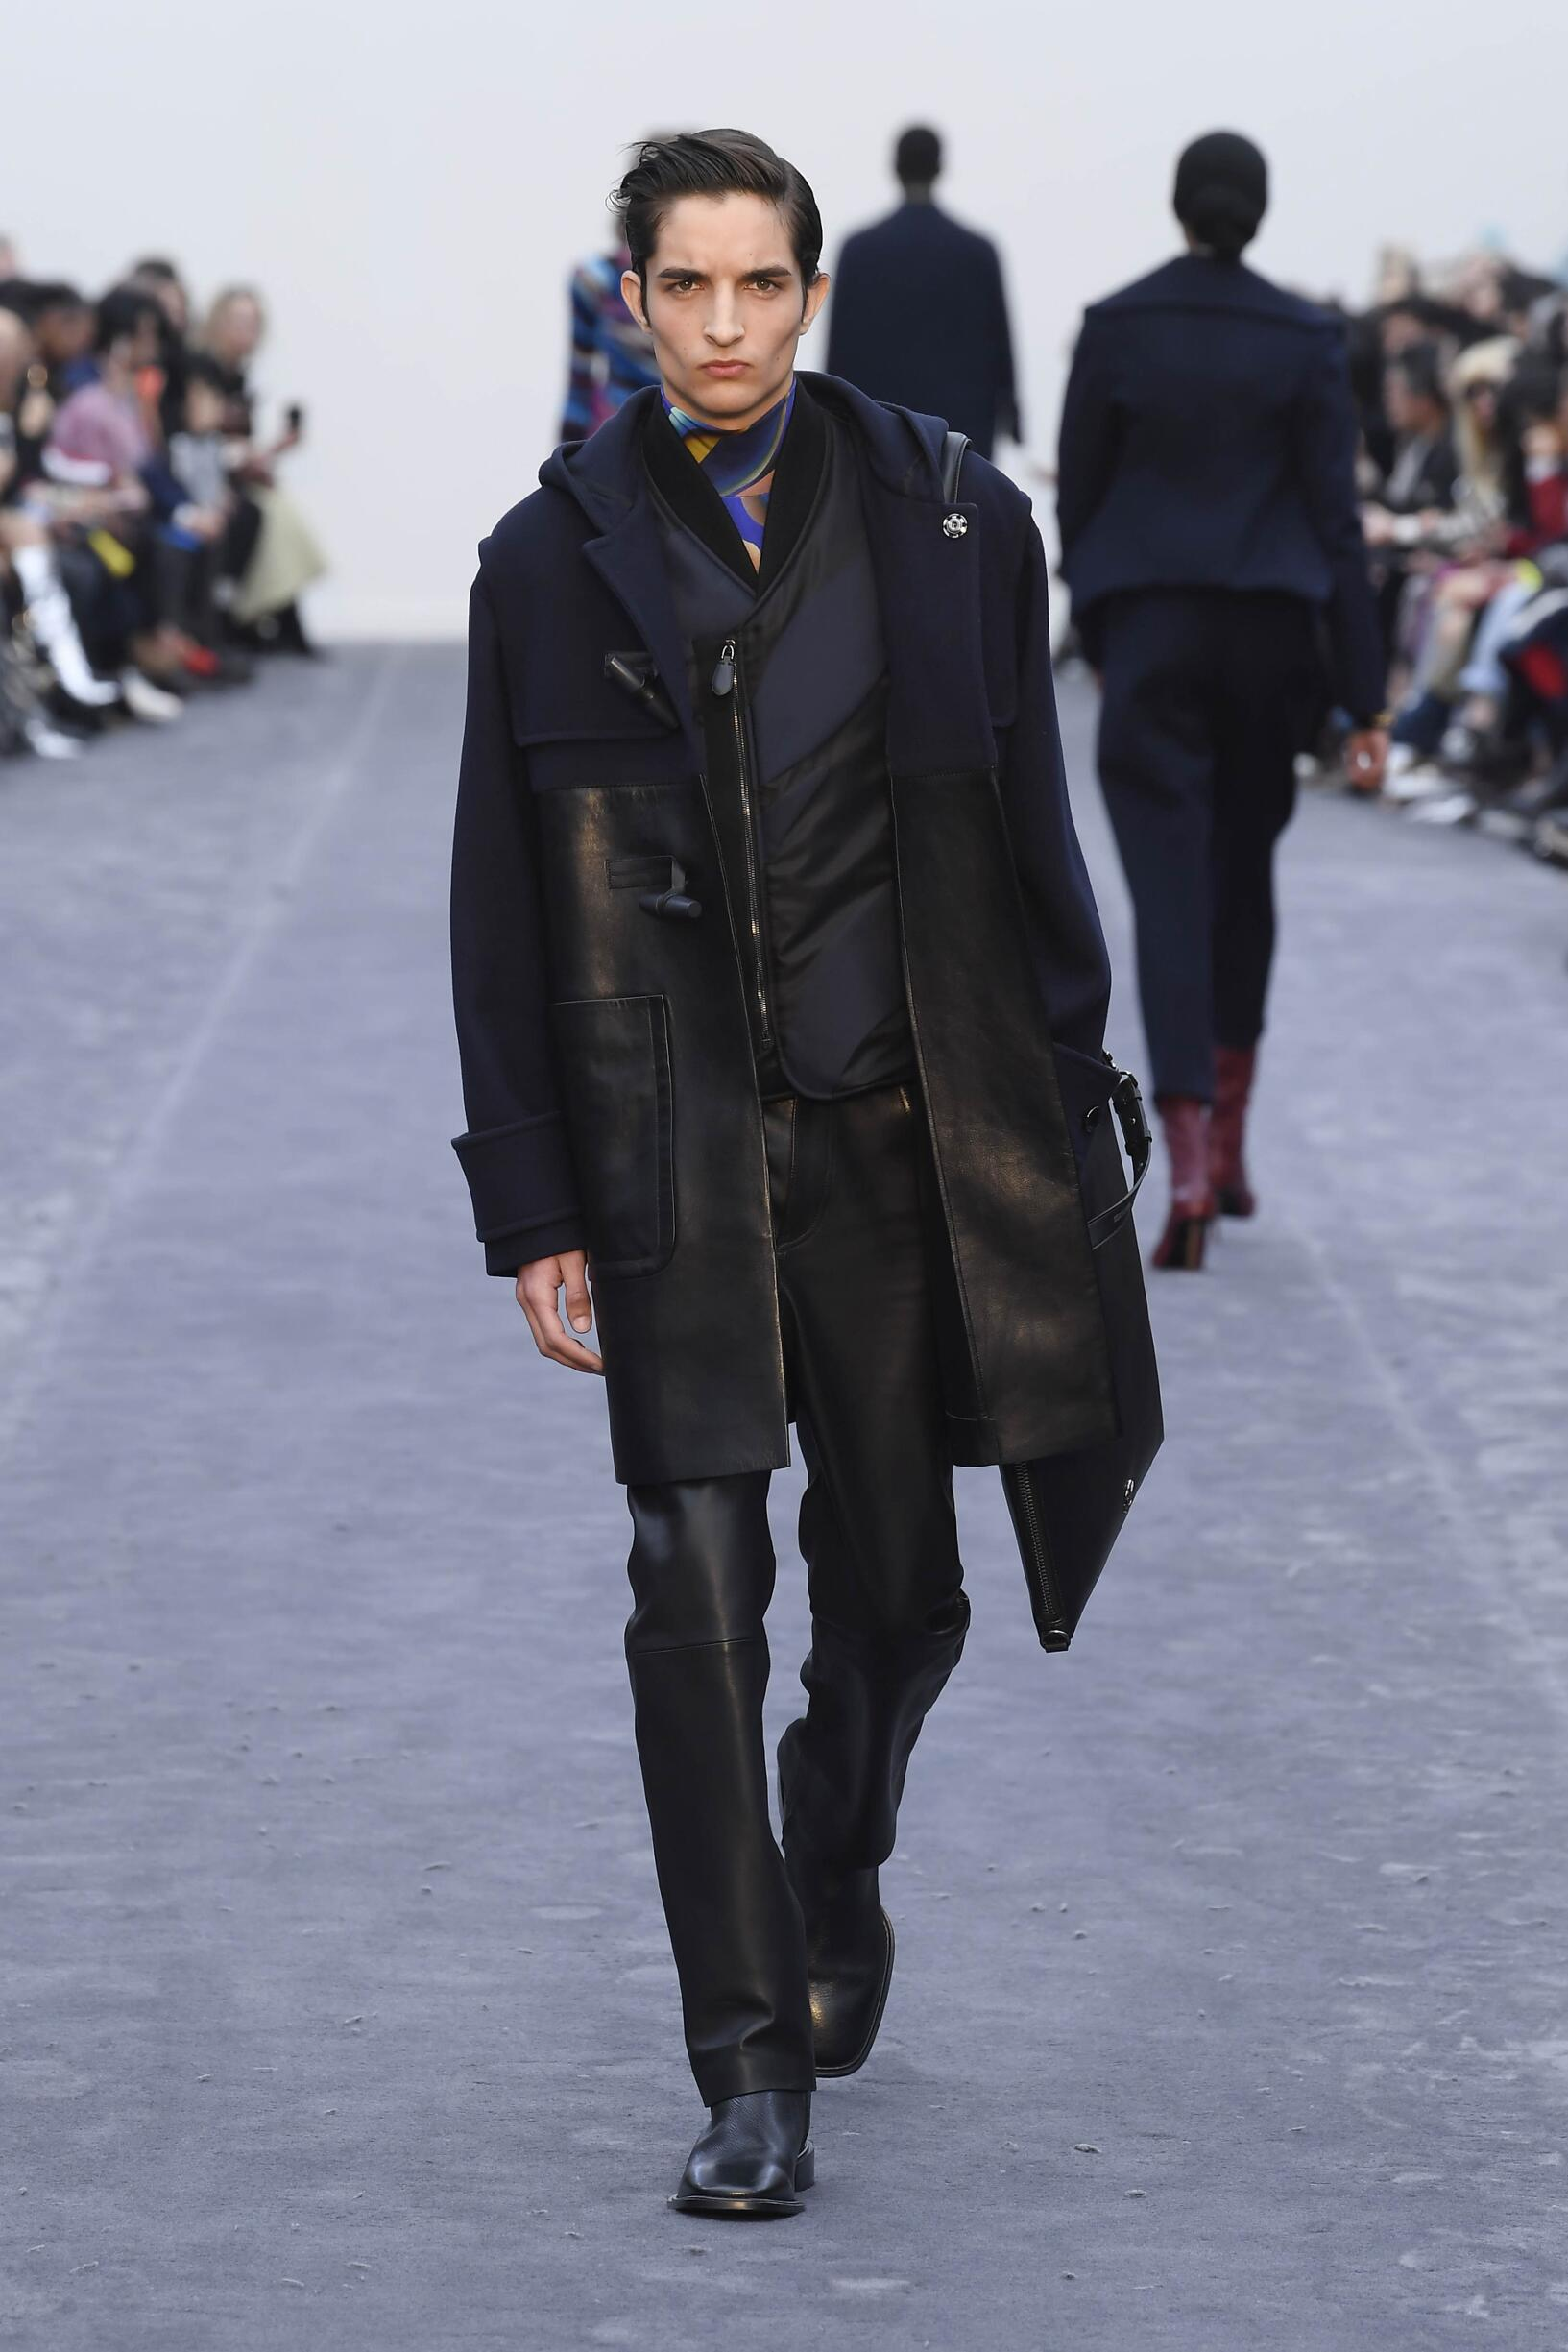 Roberto Cavalli FW 2019 Menswear